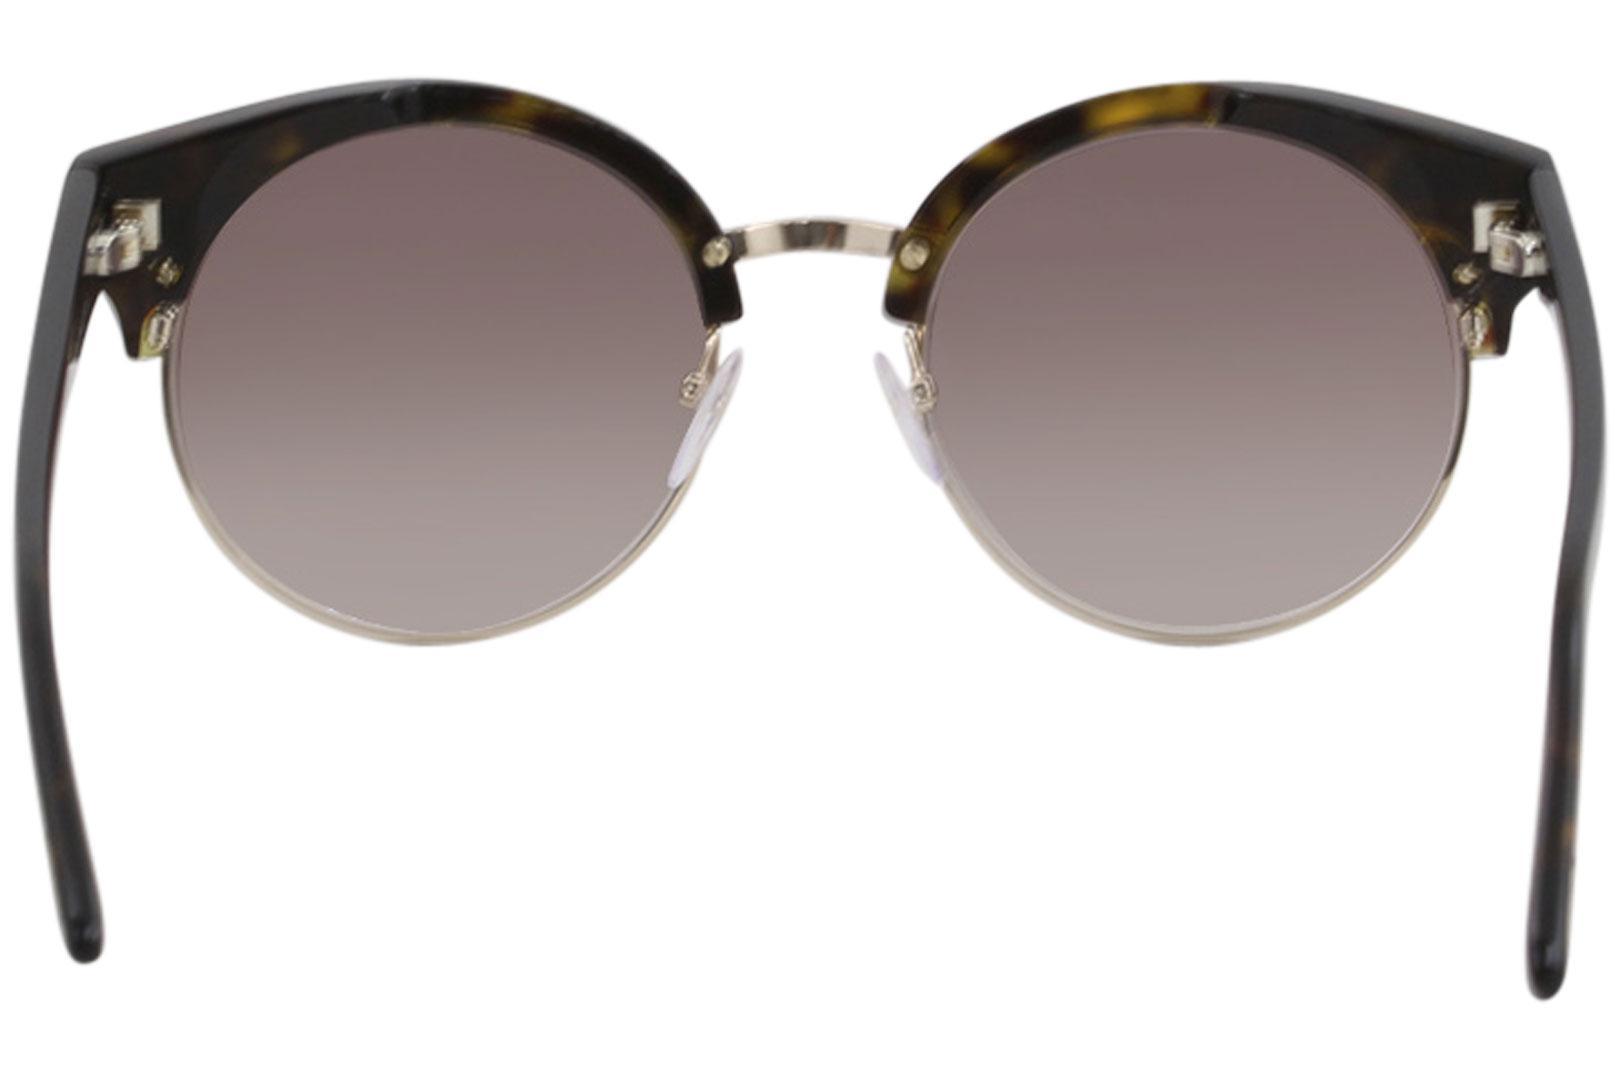 6a9cd36aaa5 Tom Ford Women s Alissa-02 TF608 TF 608 Fashion Pilot Sunglasses